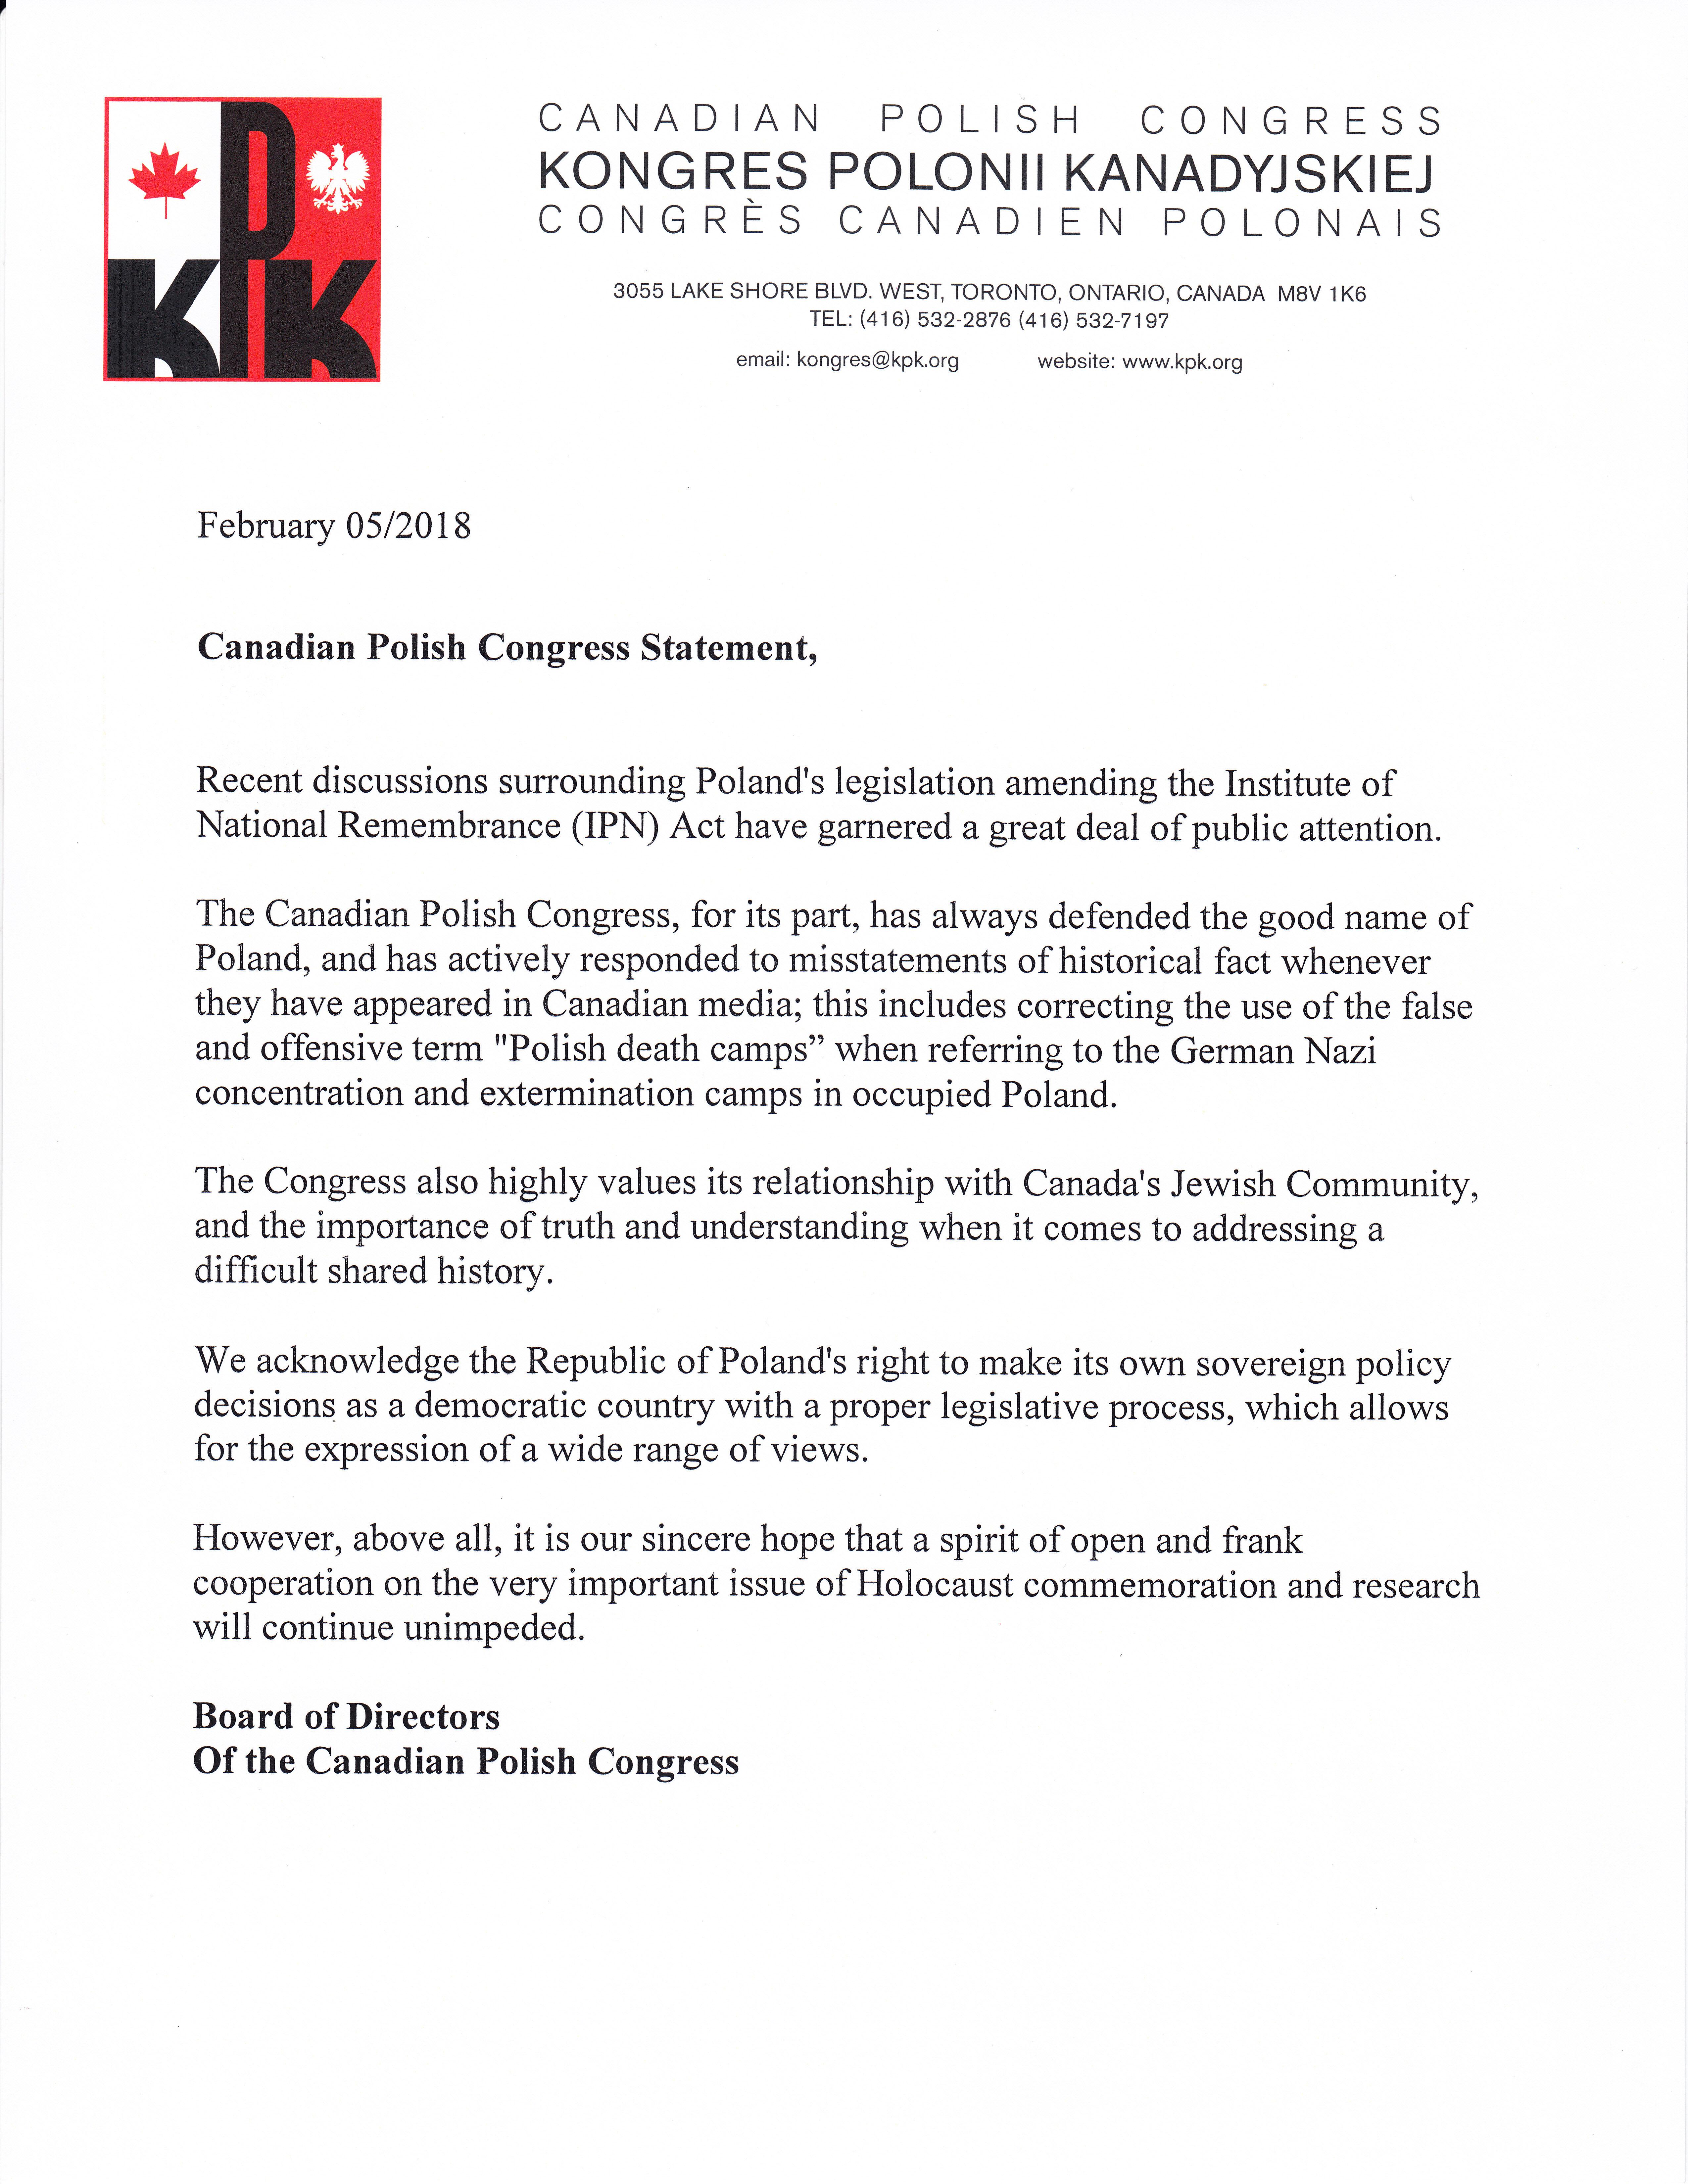 CPC Statement